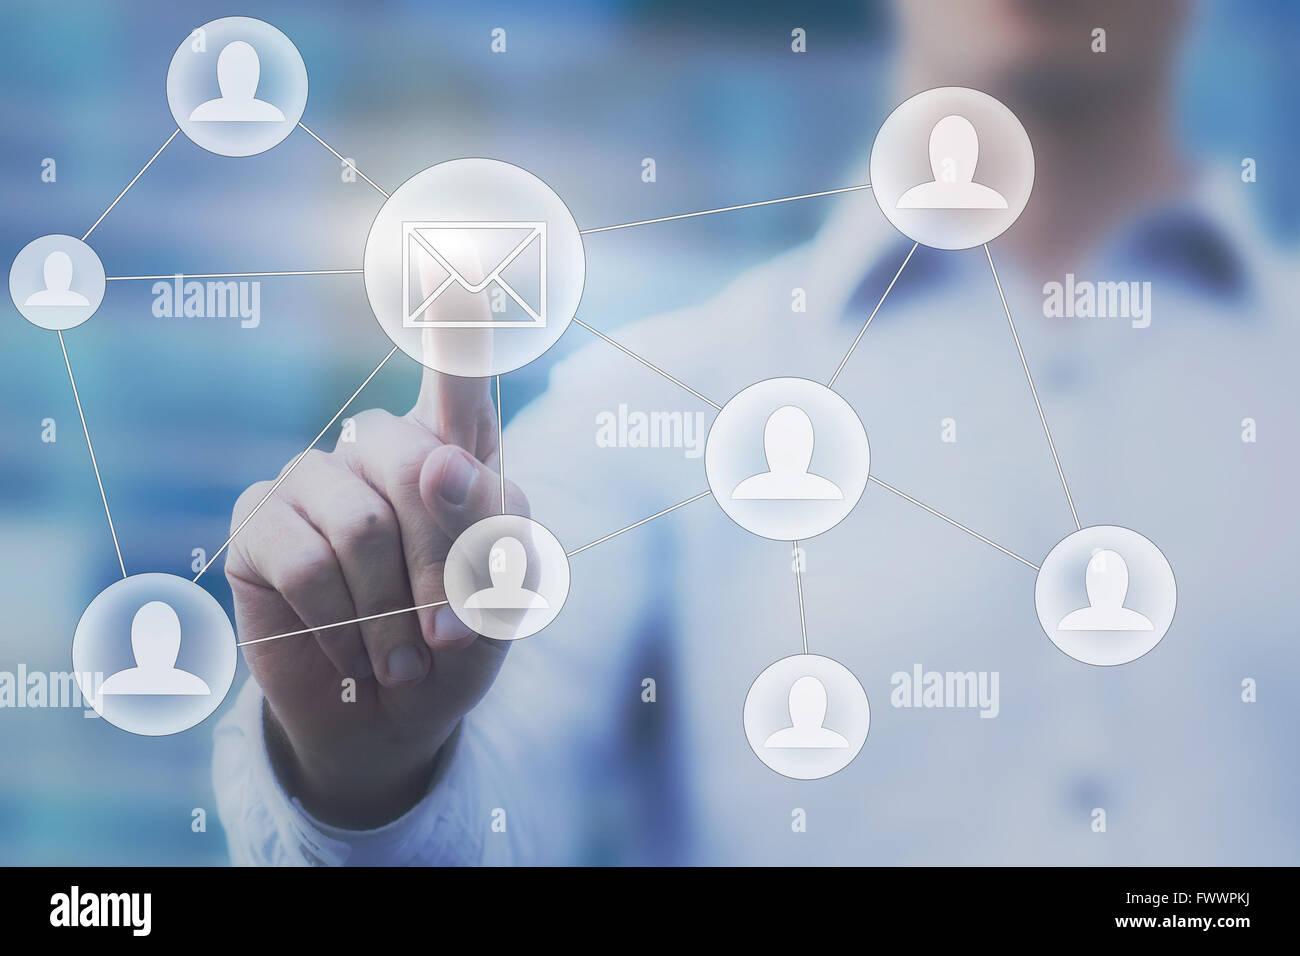 Concepto de marketing por correo electrónico Foto de stock